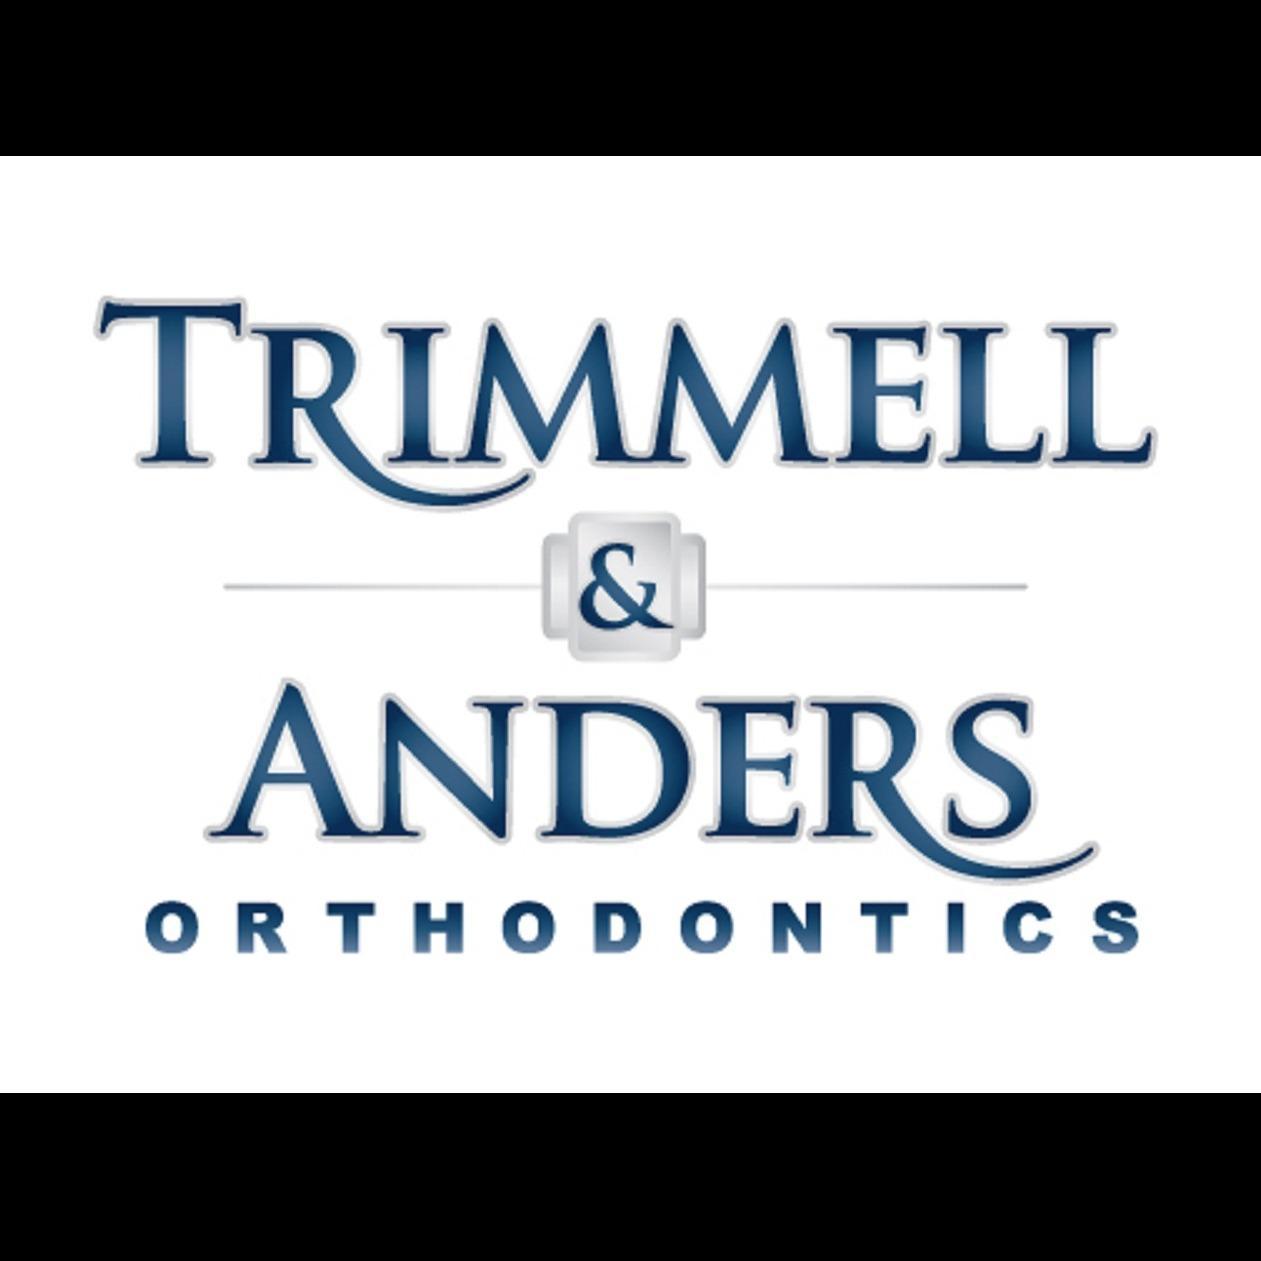 Trimmell & Anders Orthodontics - Wichita, KS - Dentists & Dental Services